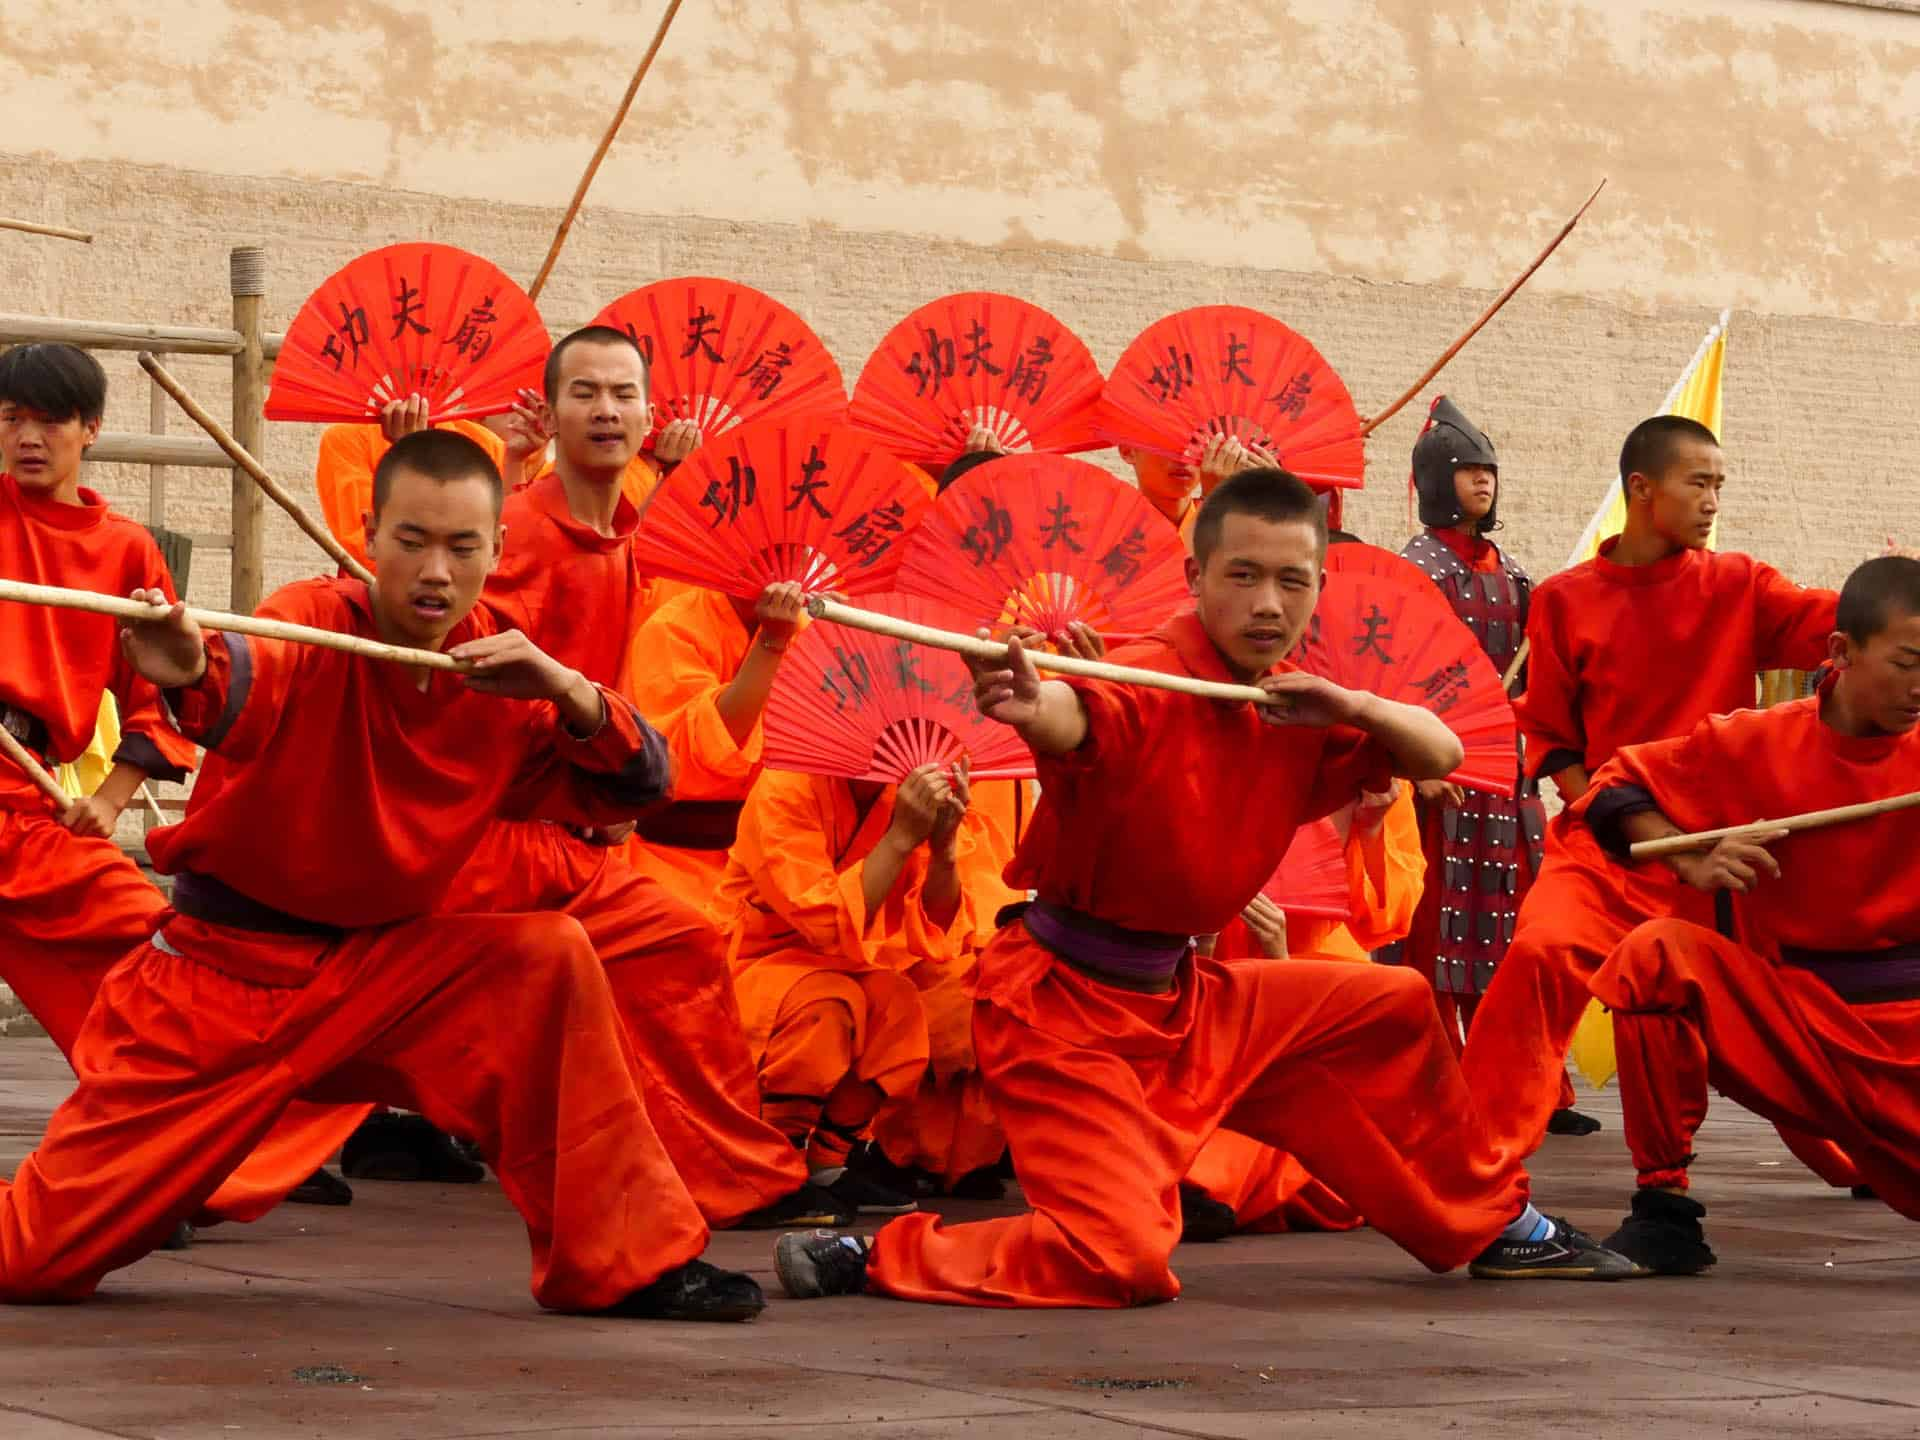 Shaolin Monks doing a Martial Arts Show in Jiayuguan Fort